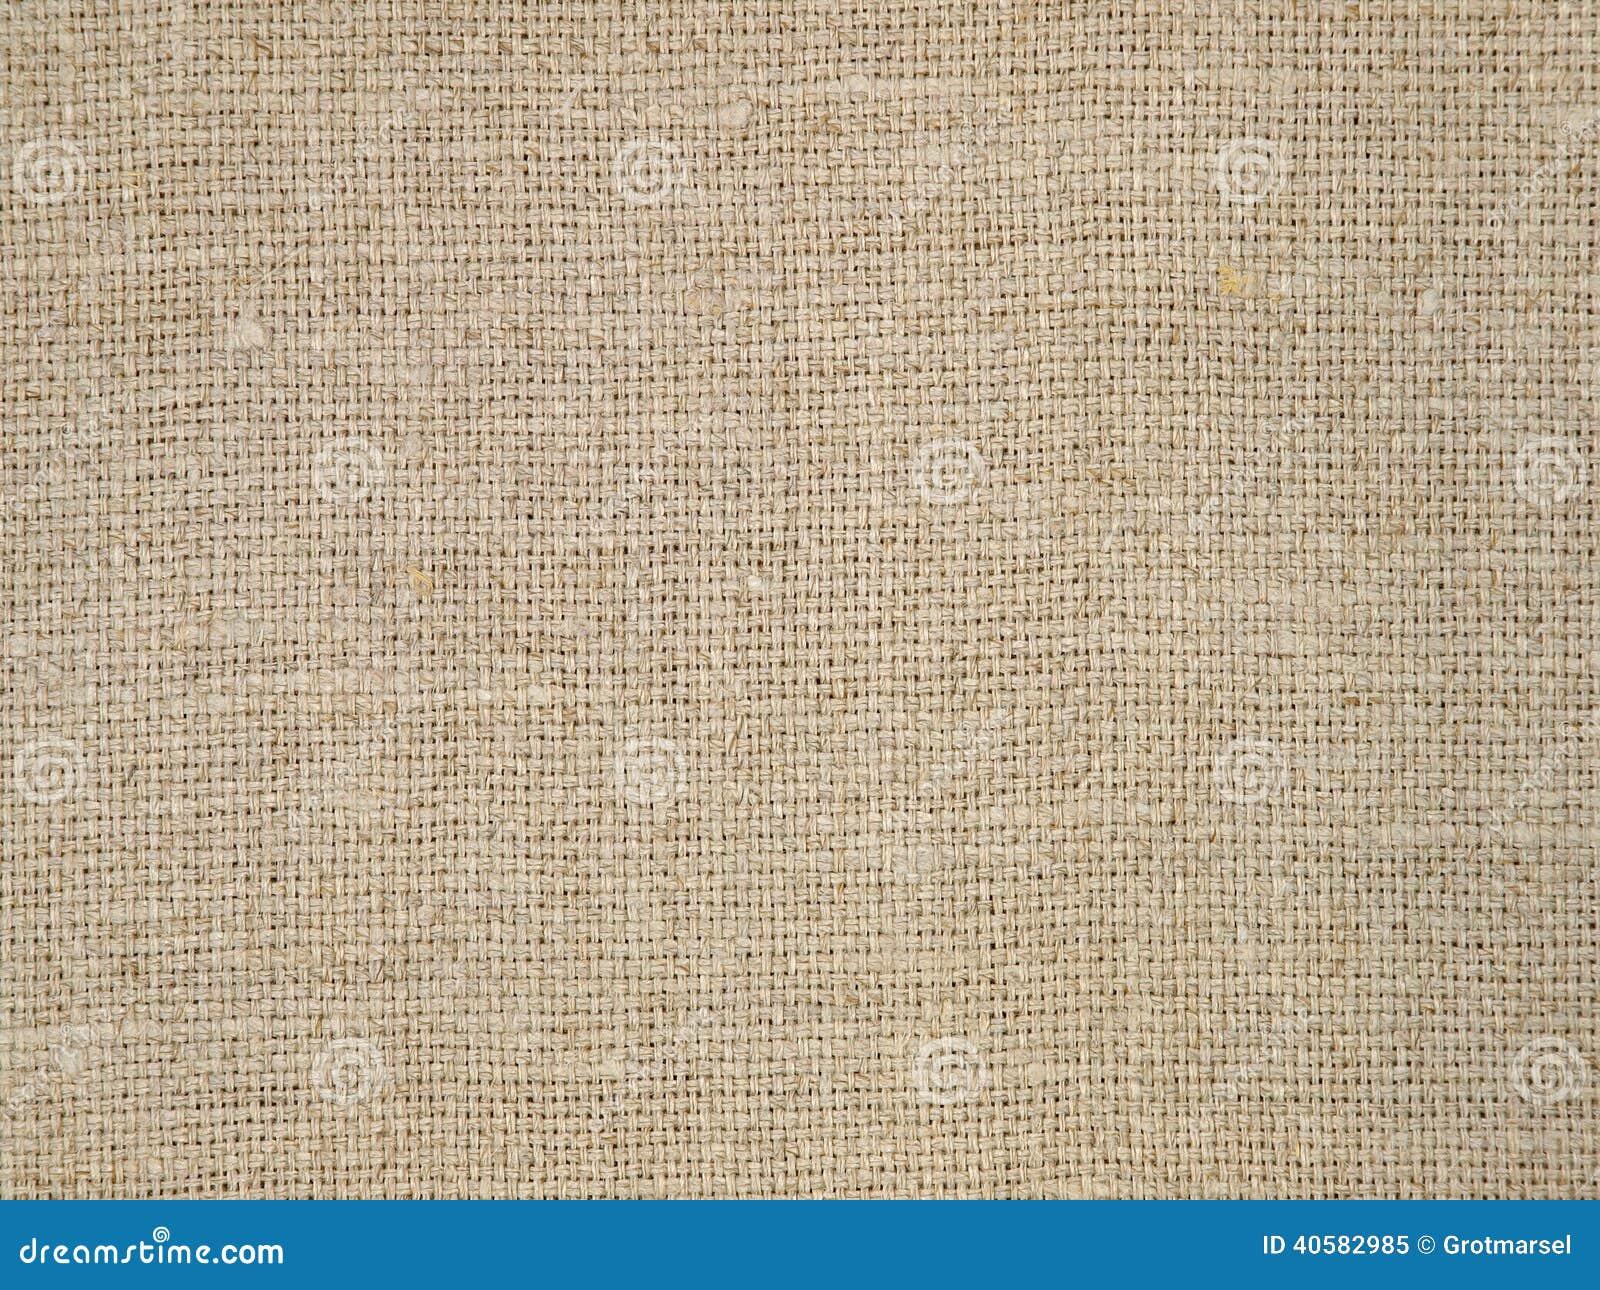 Естественная linen картина текстуры как предпосылка